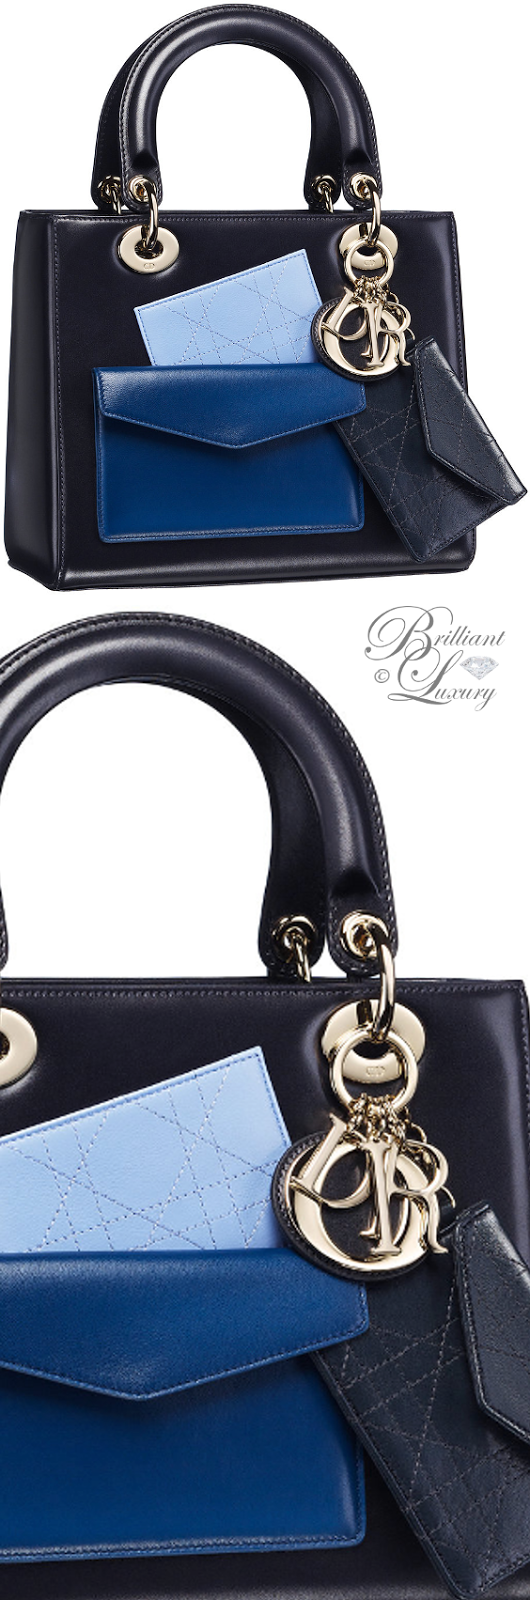 Brilliant Luxury ♦ Dior Lady Dior 'Box Calfskin With Multicoloured Pockets' Bag